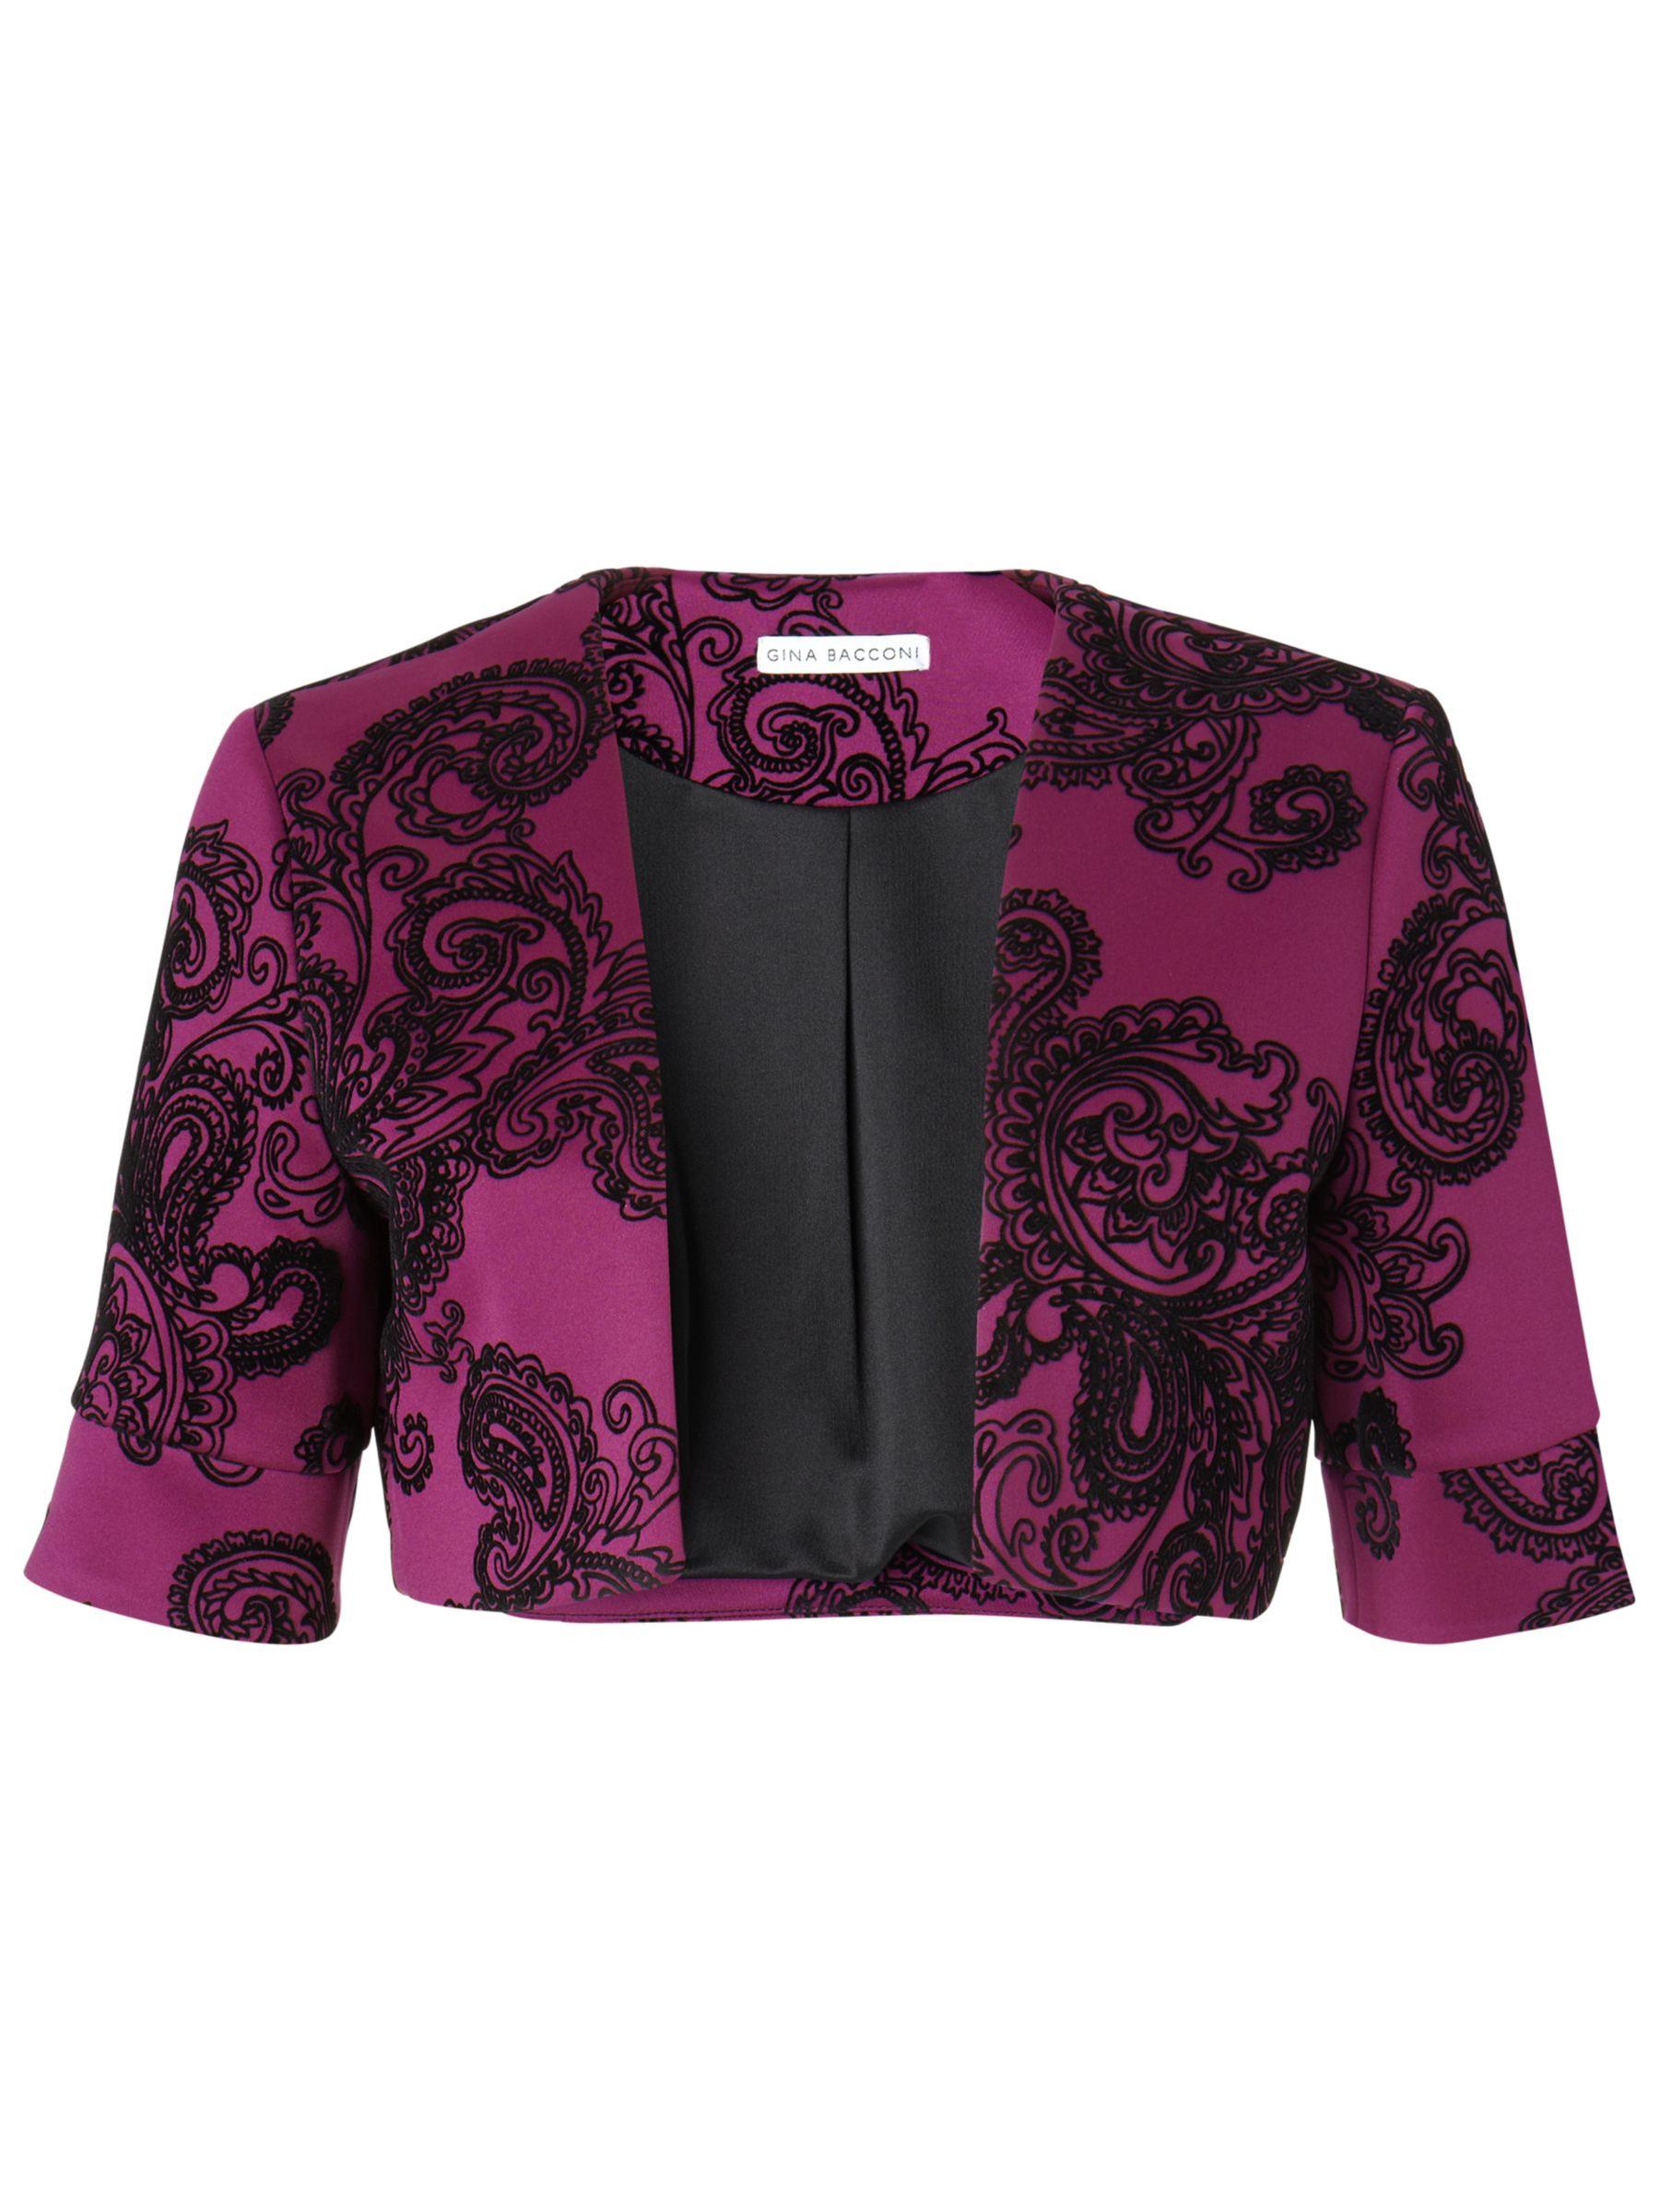 Gina Bacconi Velvet Paisley Stretch Bolero Jacket, Magenta